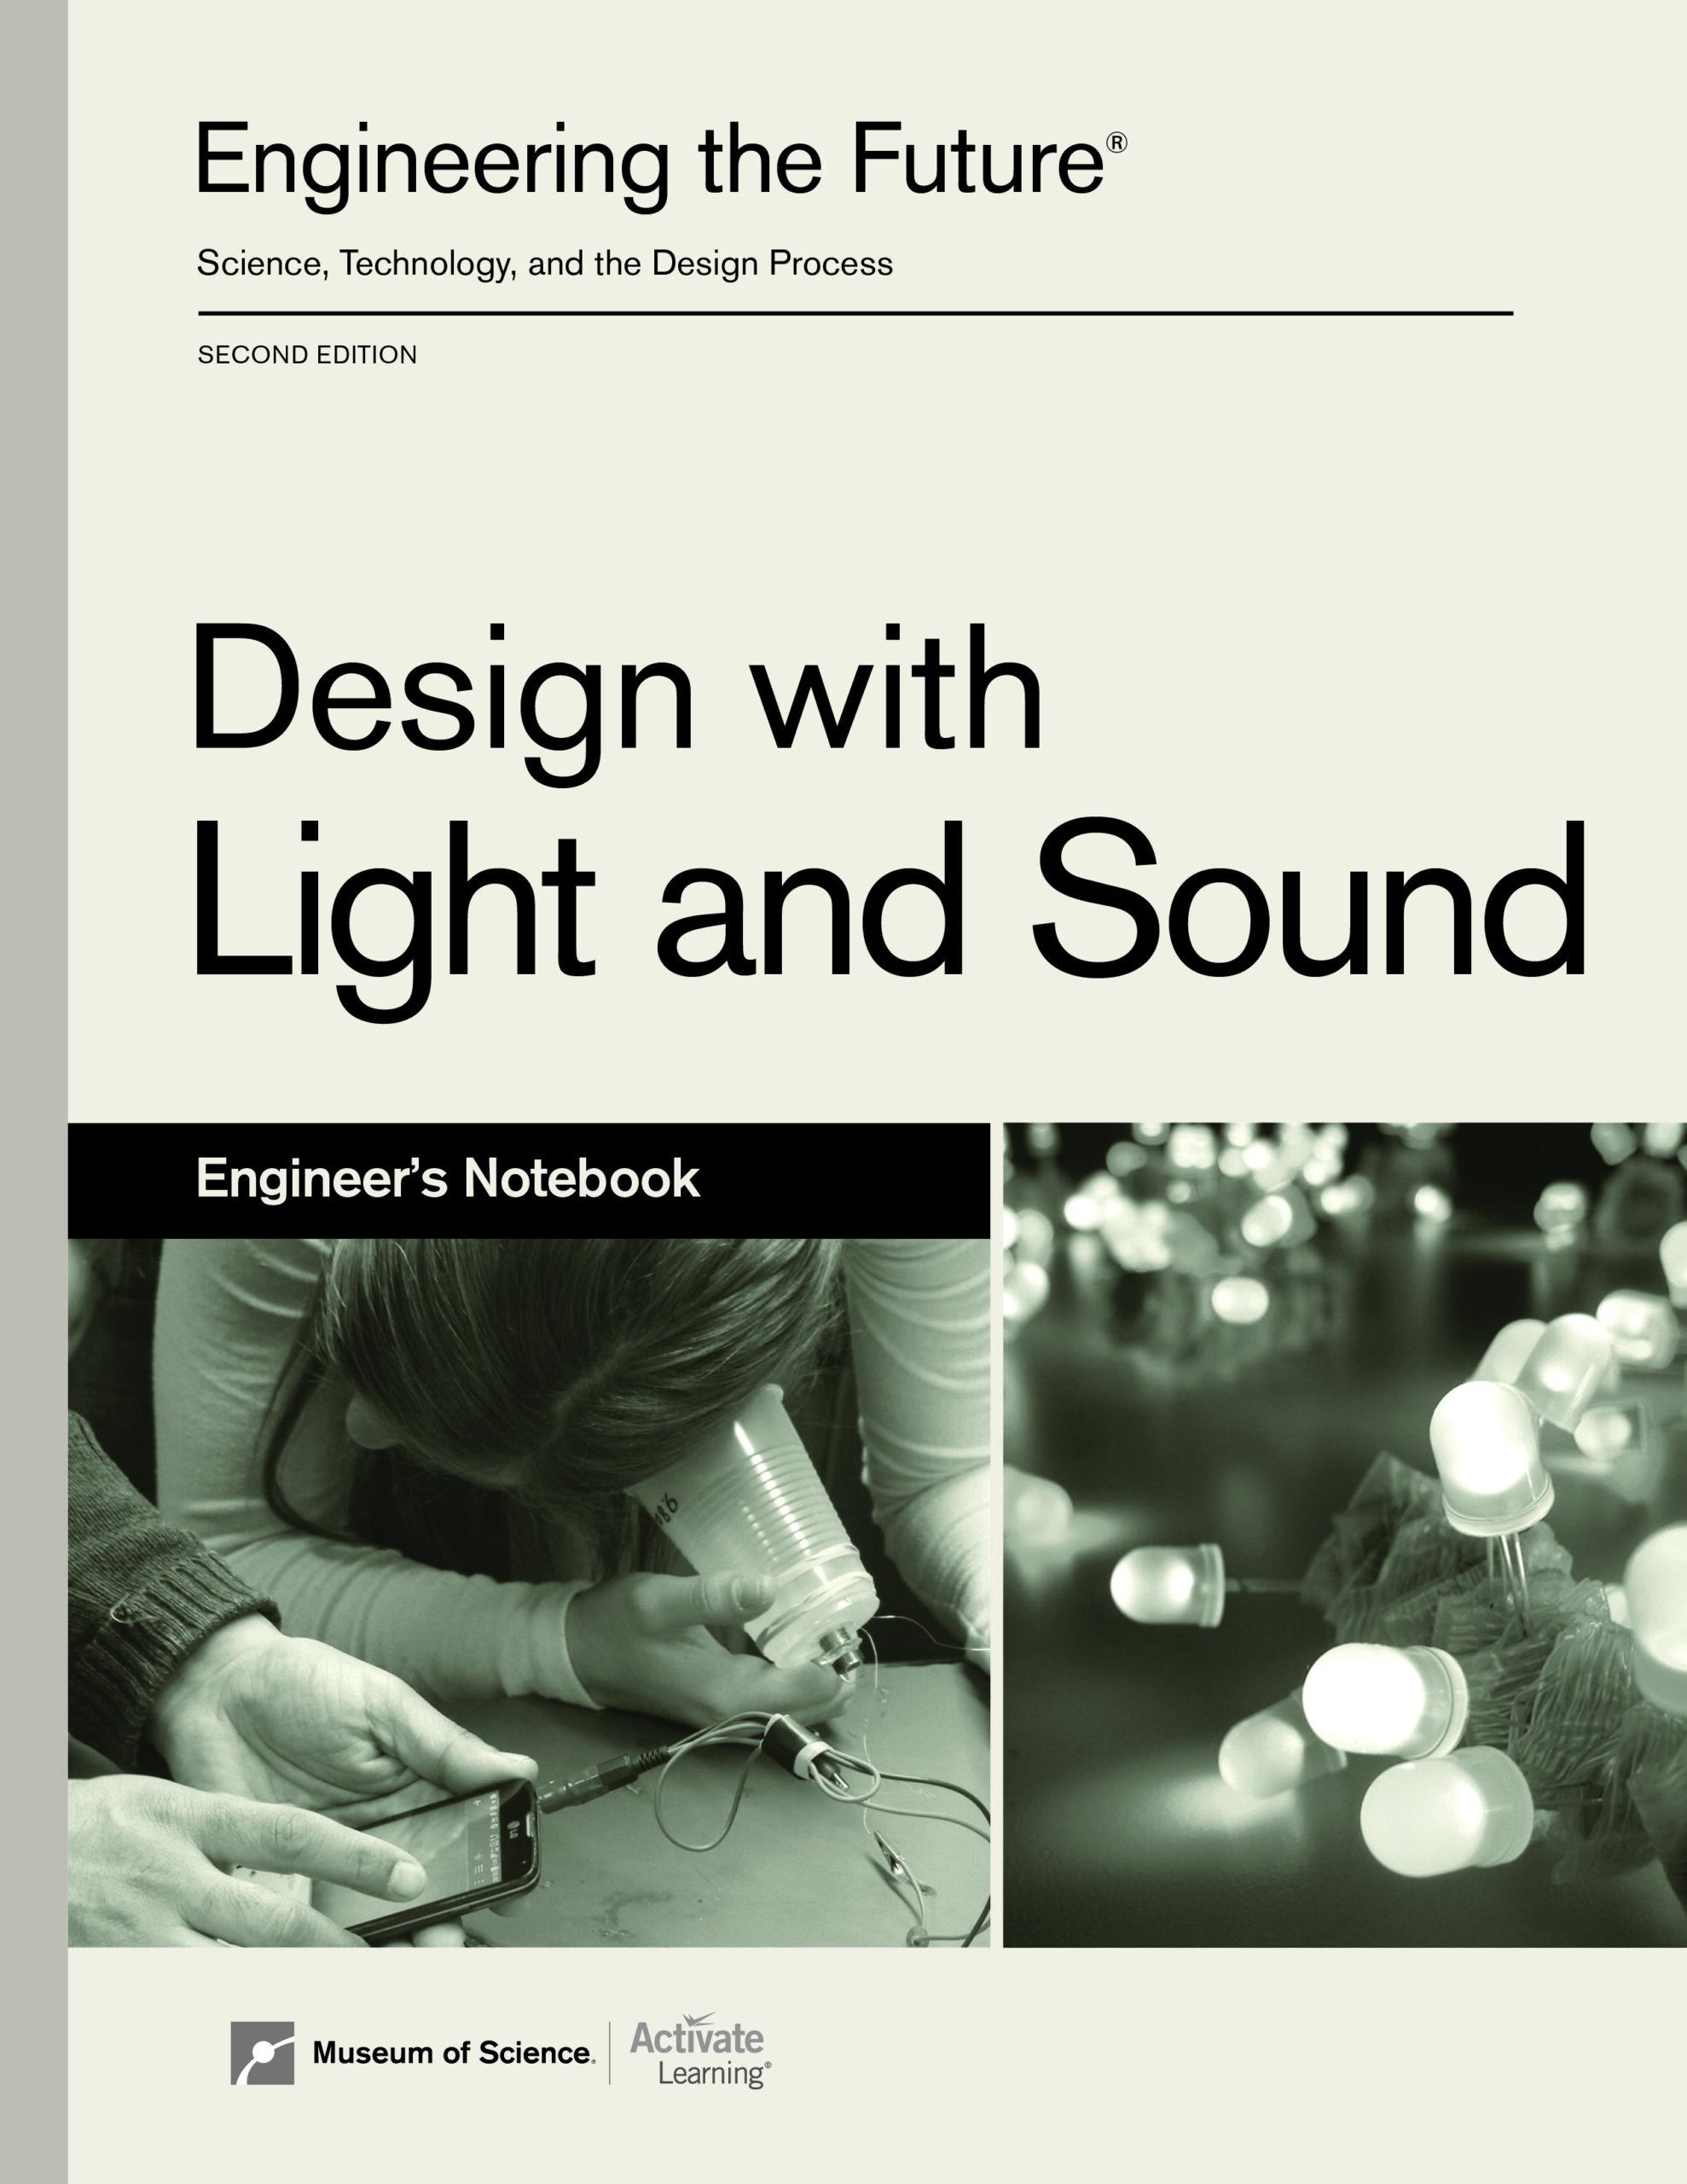 EtF_ENB_2ndEd_LightSound_cover